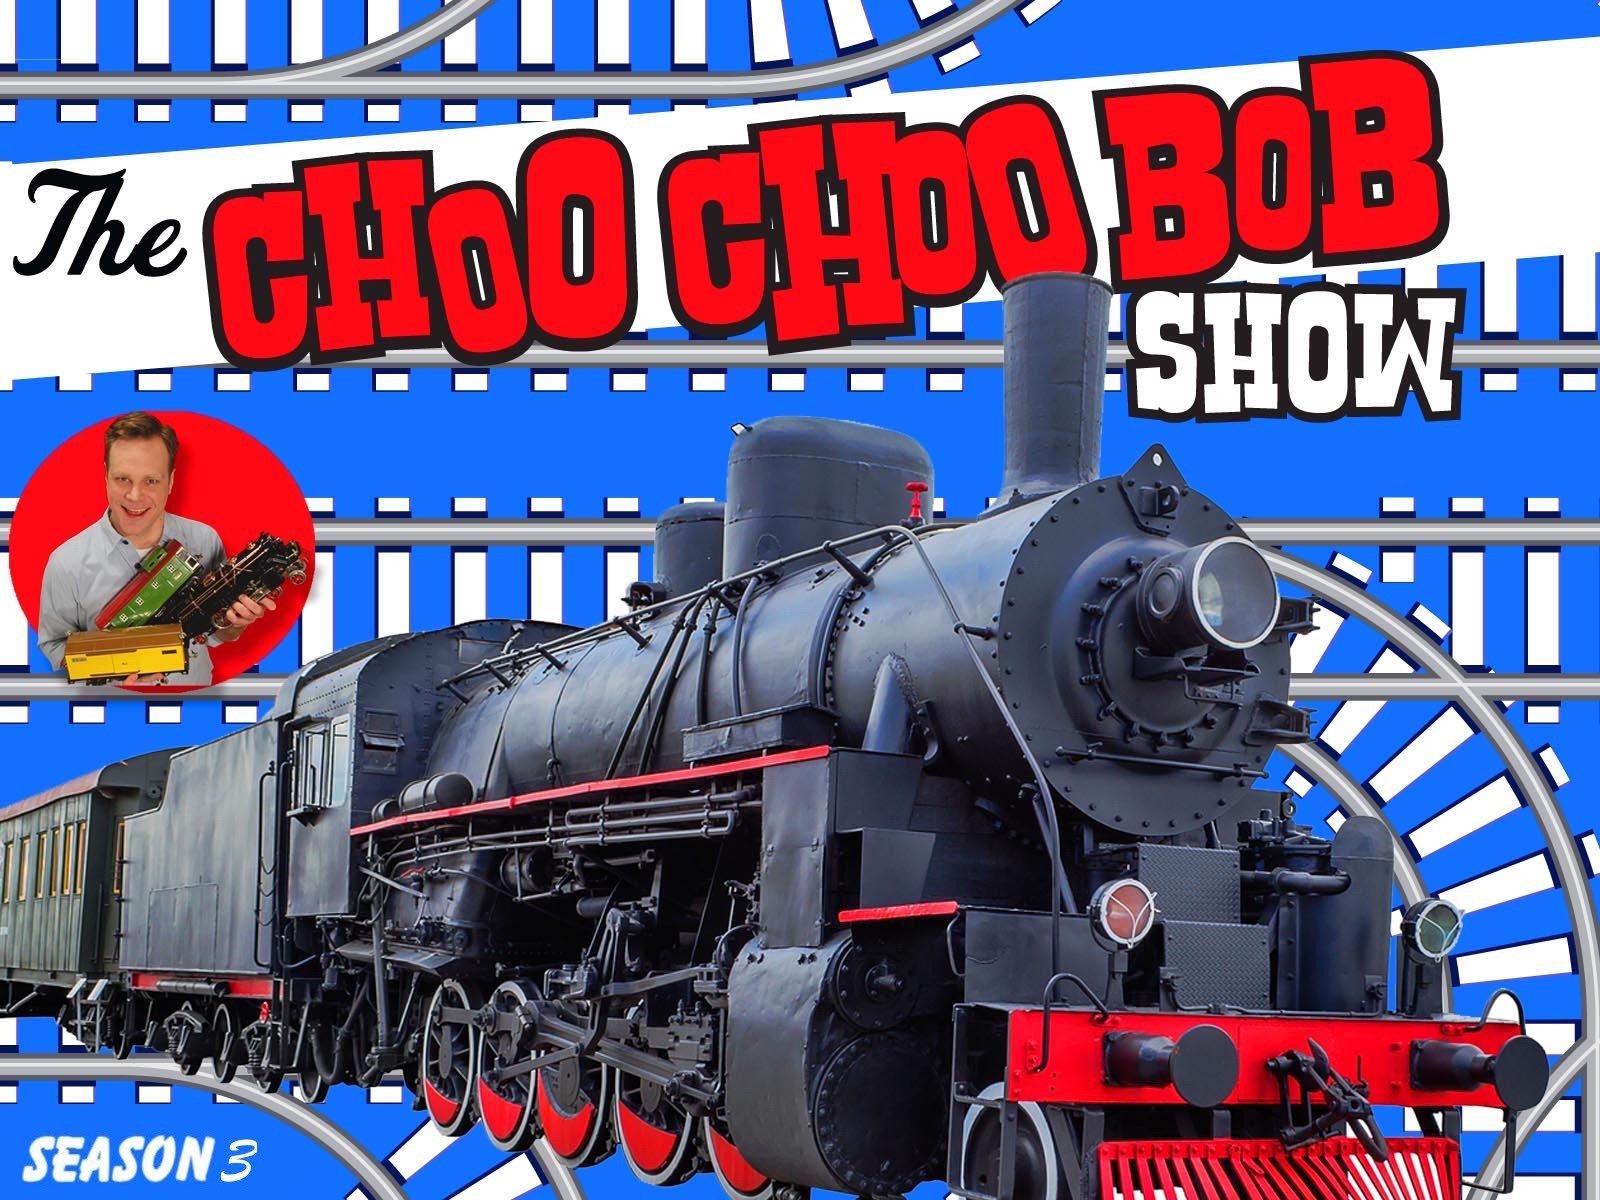 The Choo Choo Bob Show - Season 3